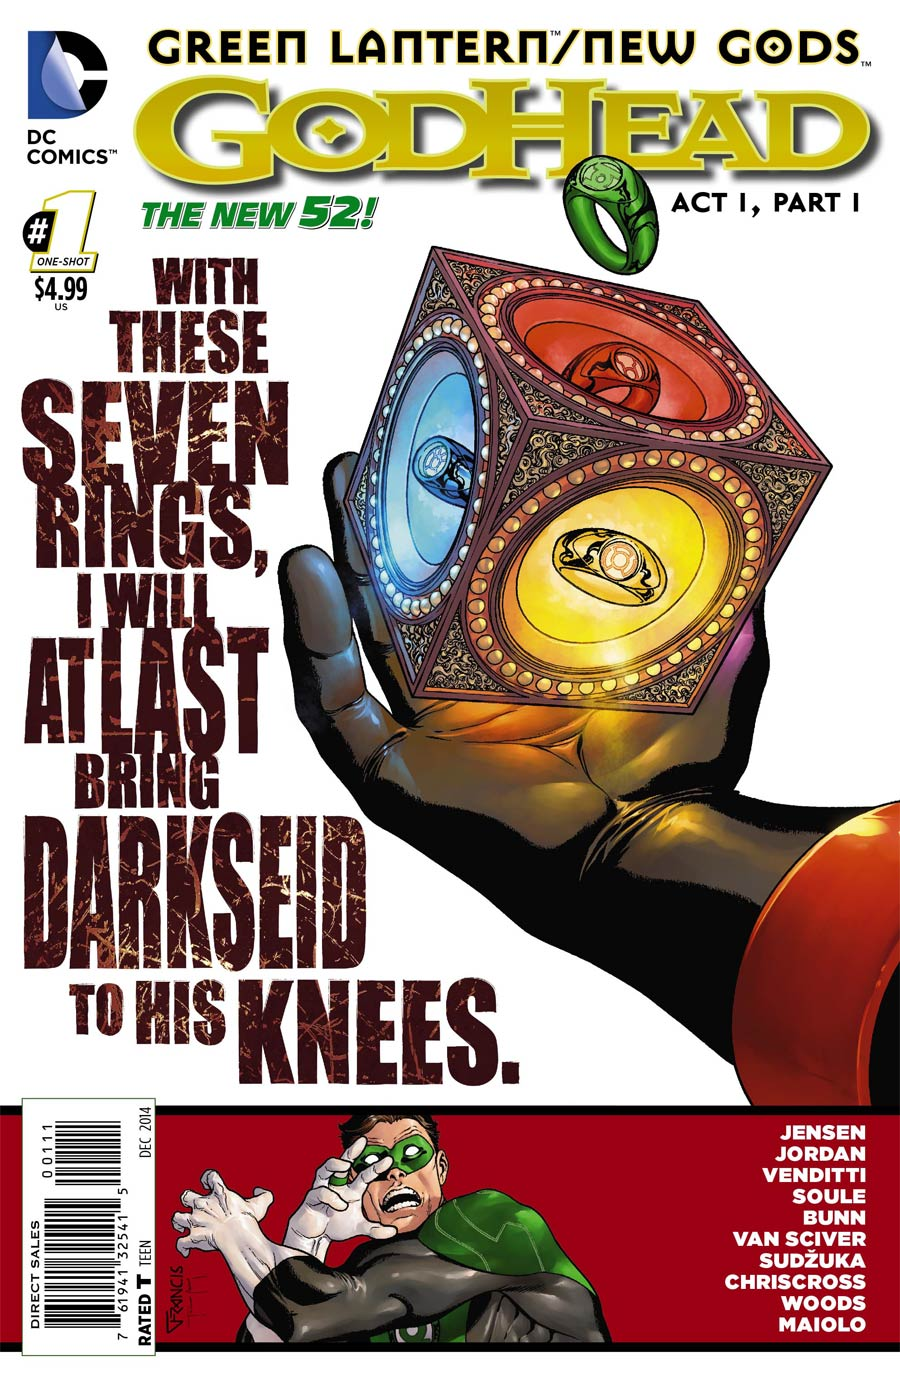 Green Lantern New Gods Godhead #1 Cover A Regular Francis Portela Cover (Godhead Act 1 Part 1)